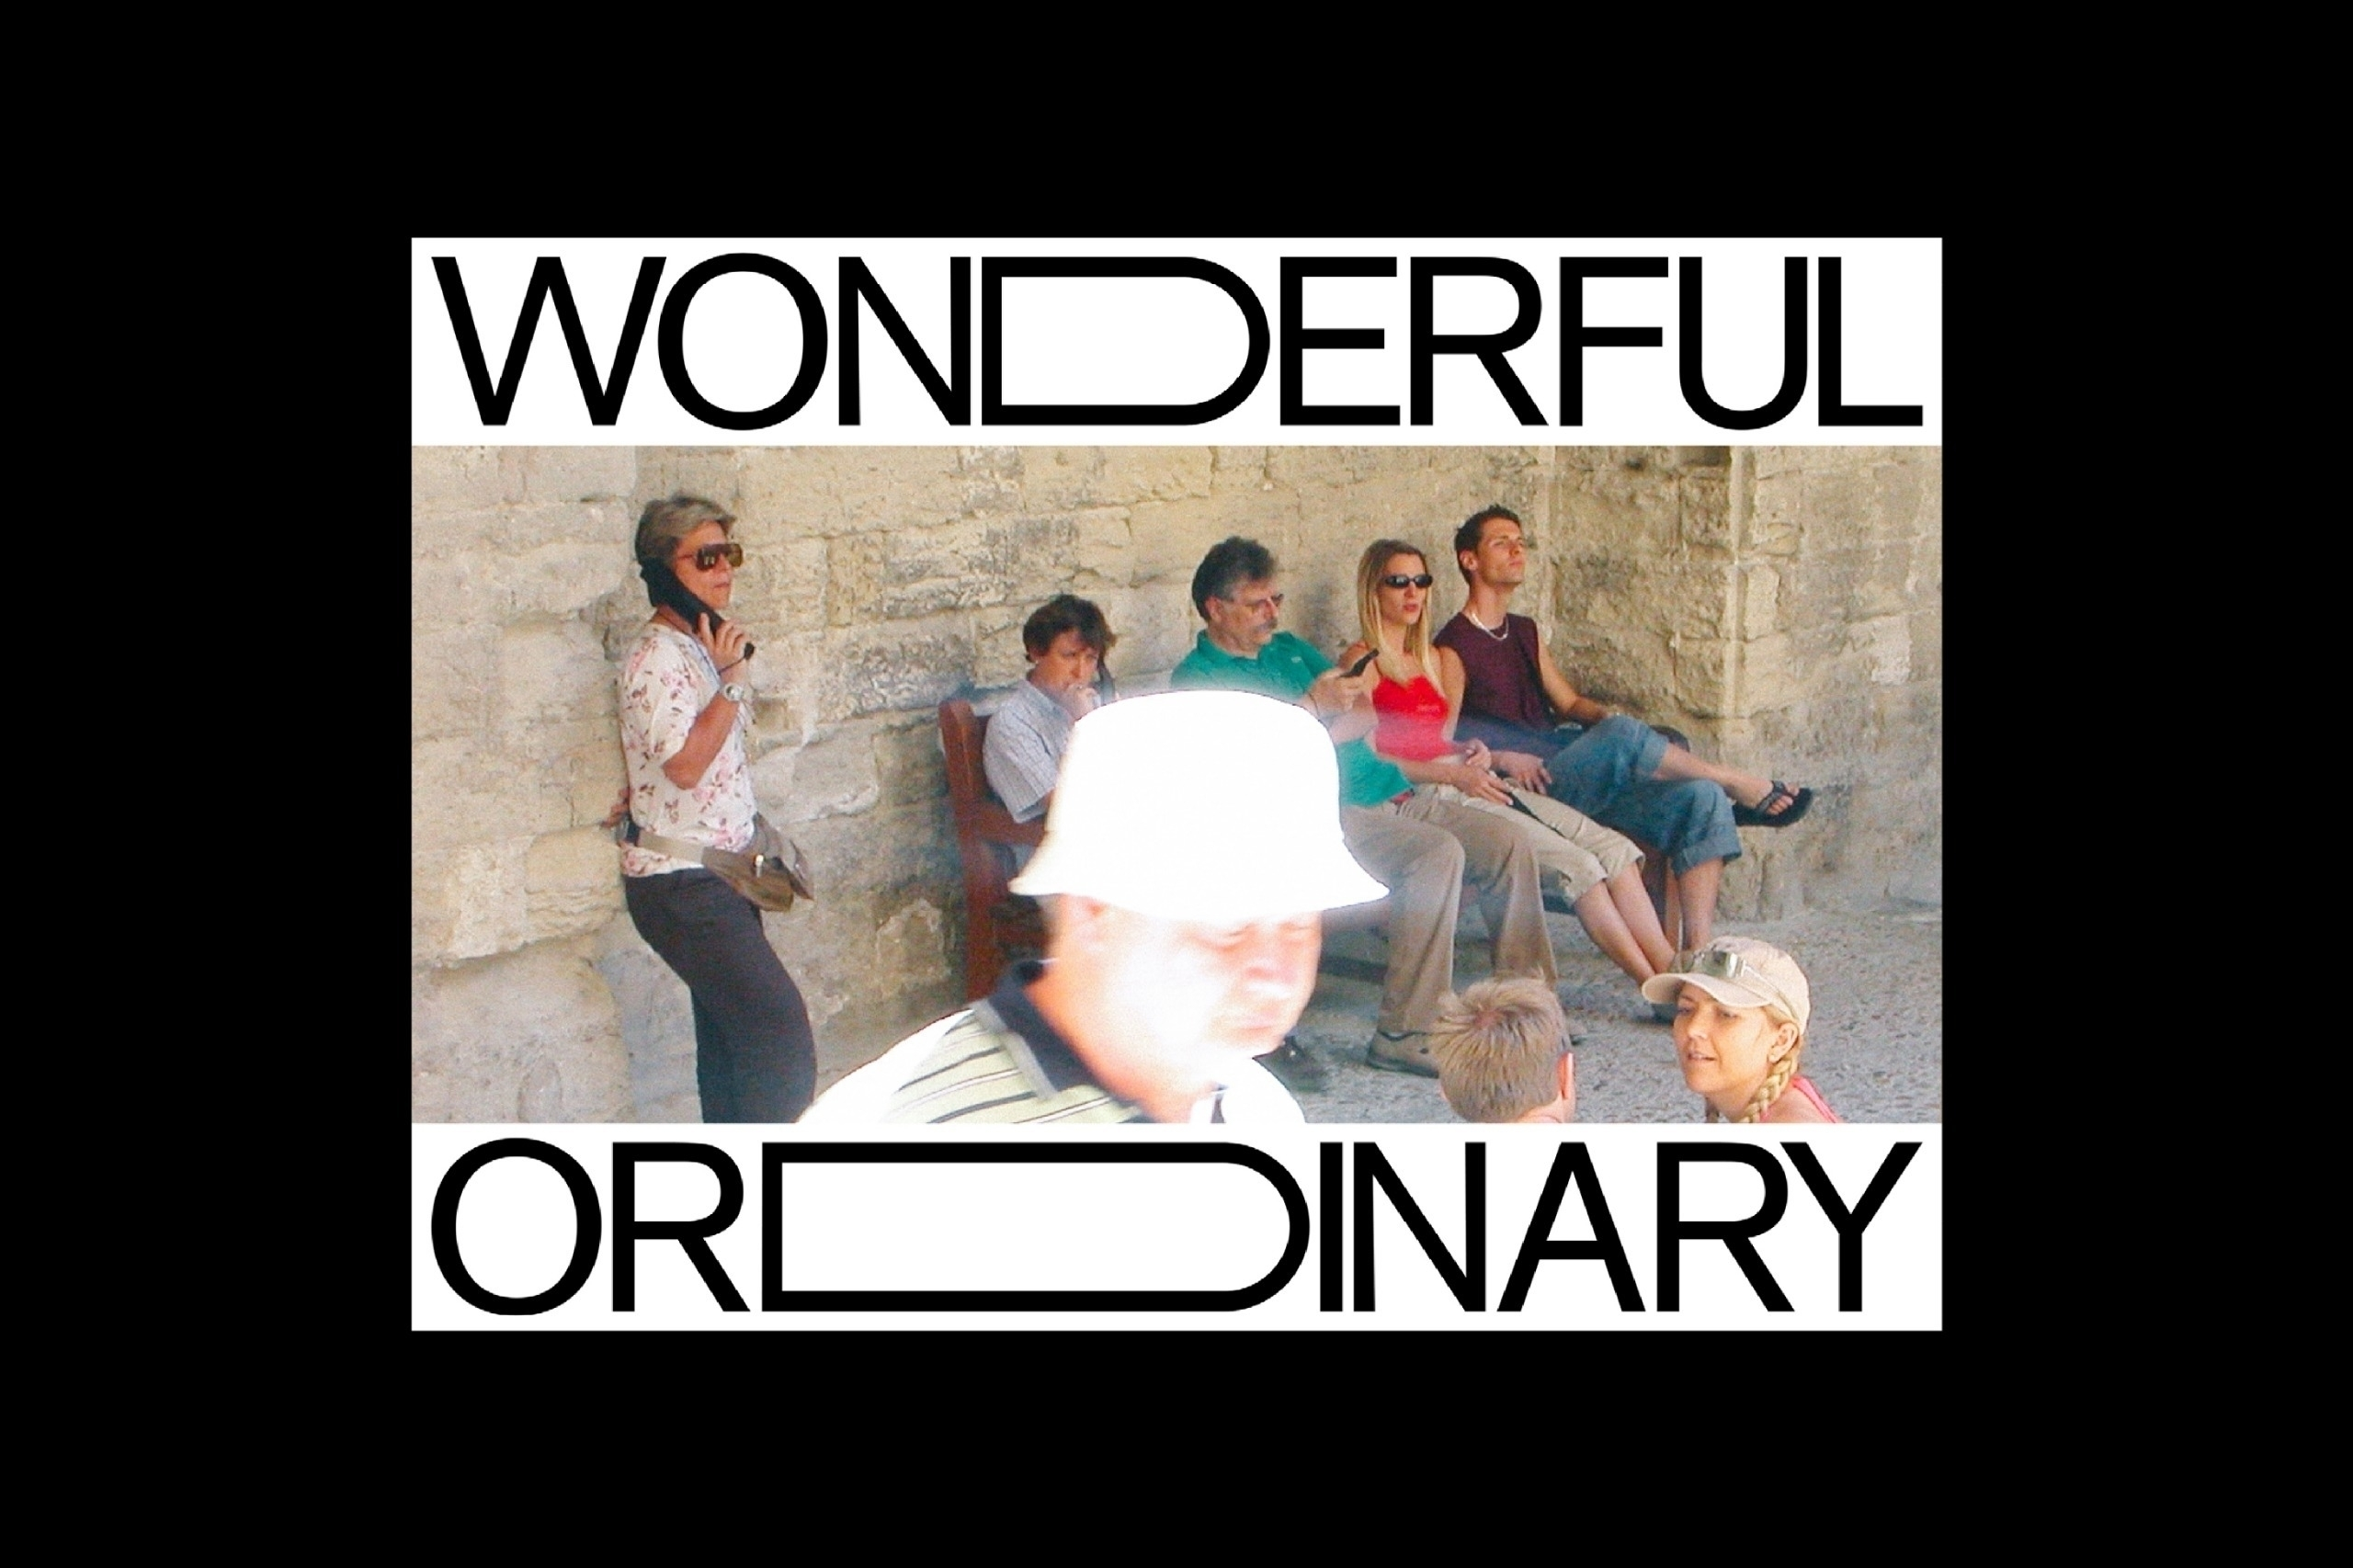 Wonderful Ordinary 2017 Graphic - studioreko   ello